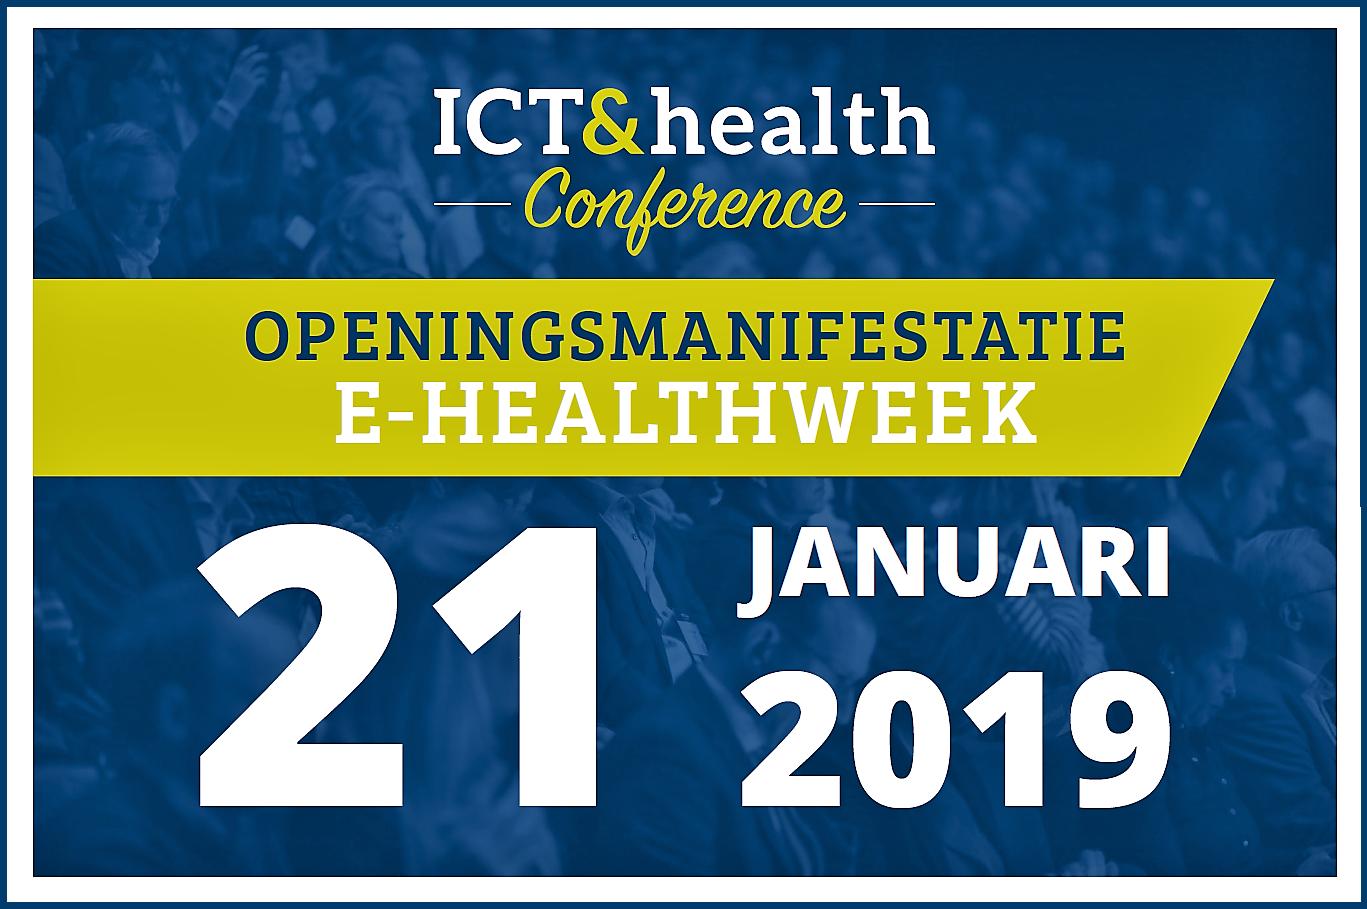 openingsmanifestatie E-healthweek 2019 ICT&health e-health zorg